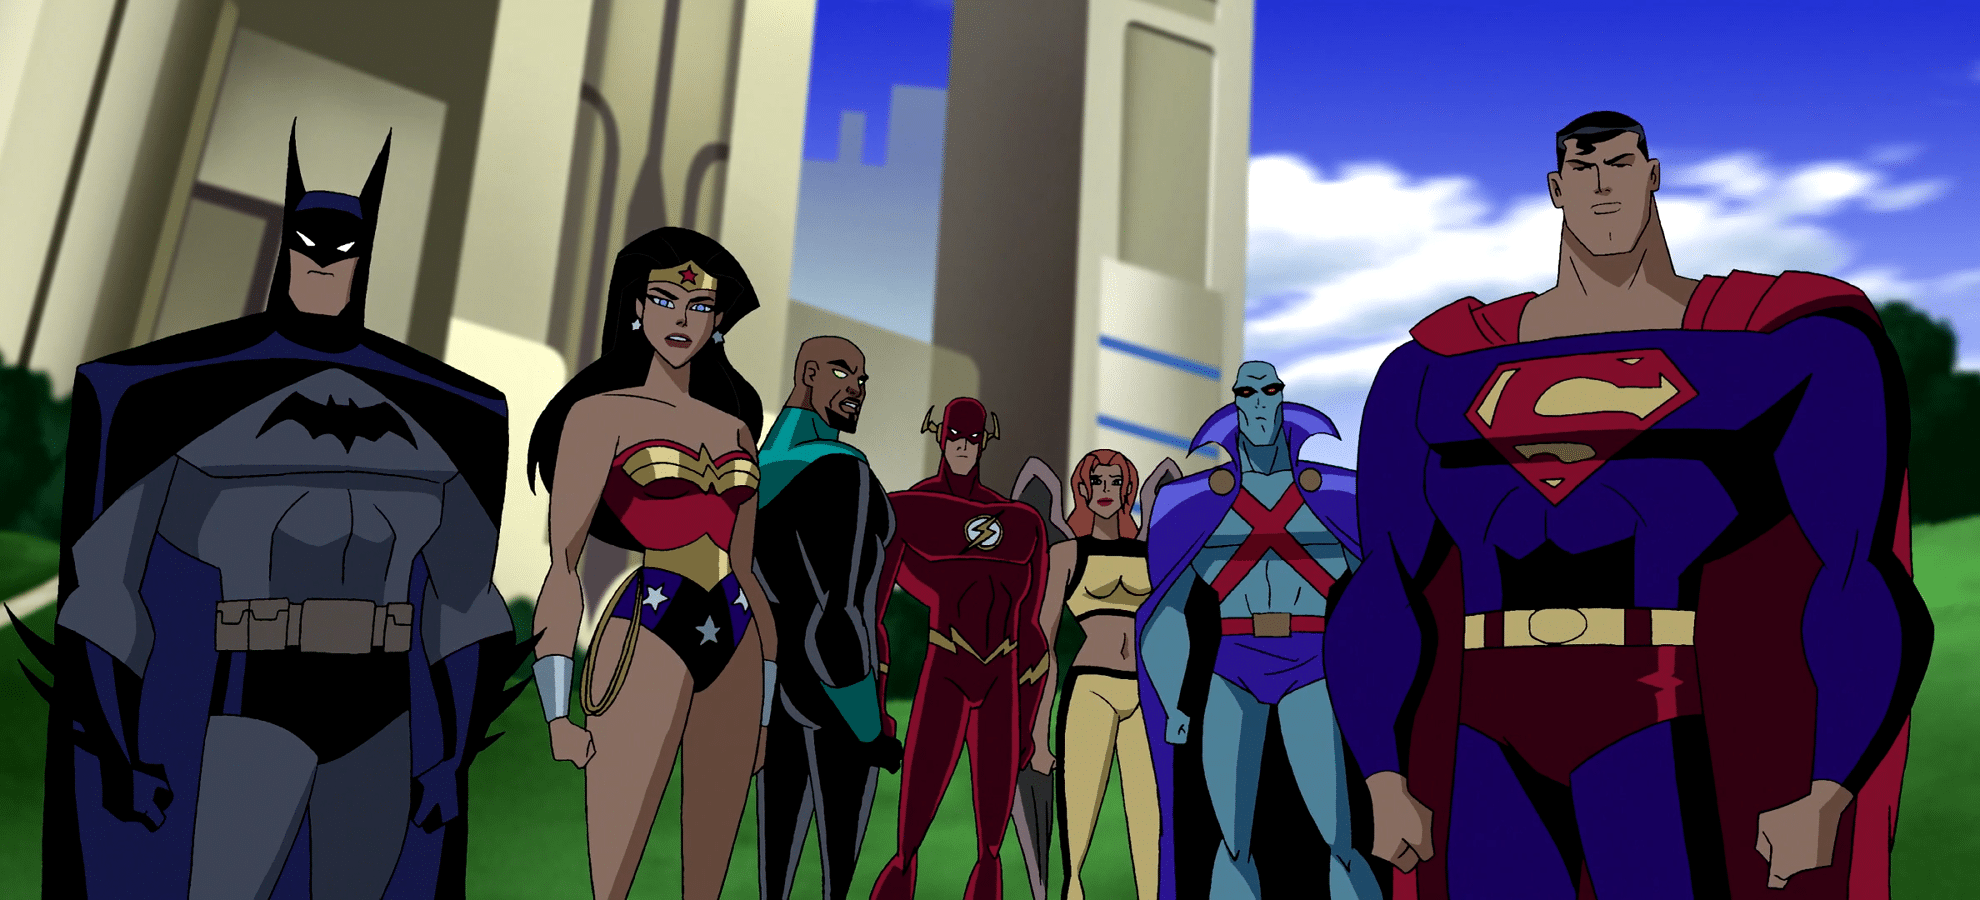 DCAU's Justice League